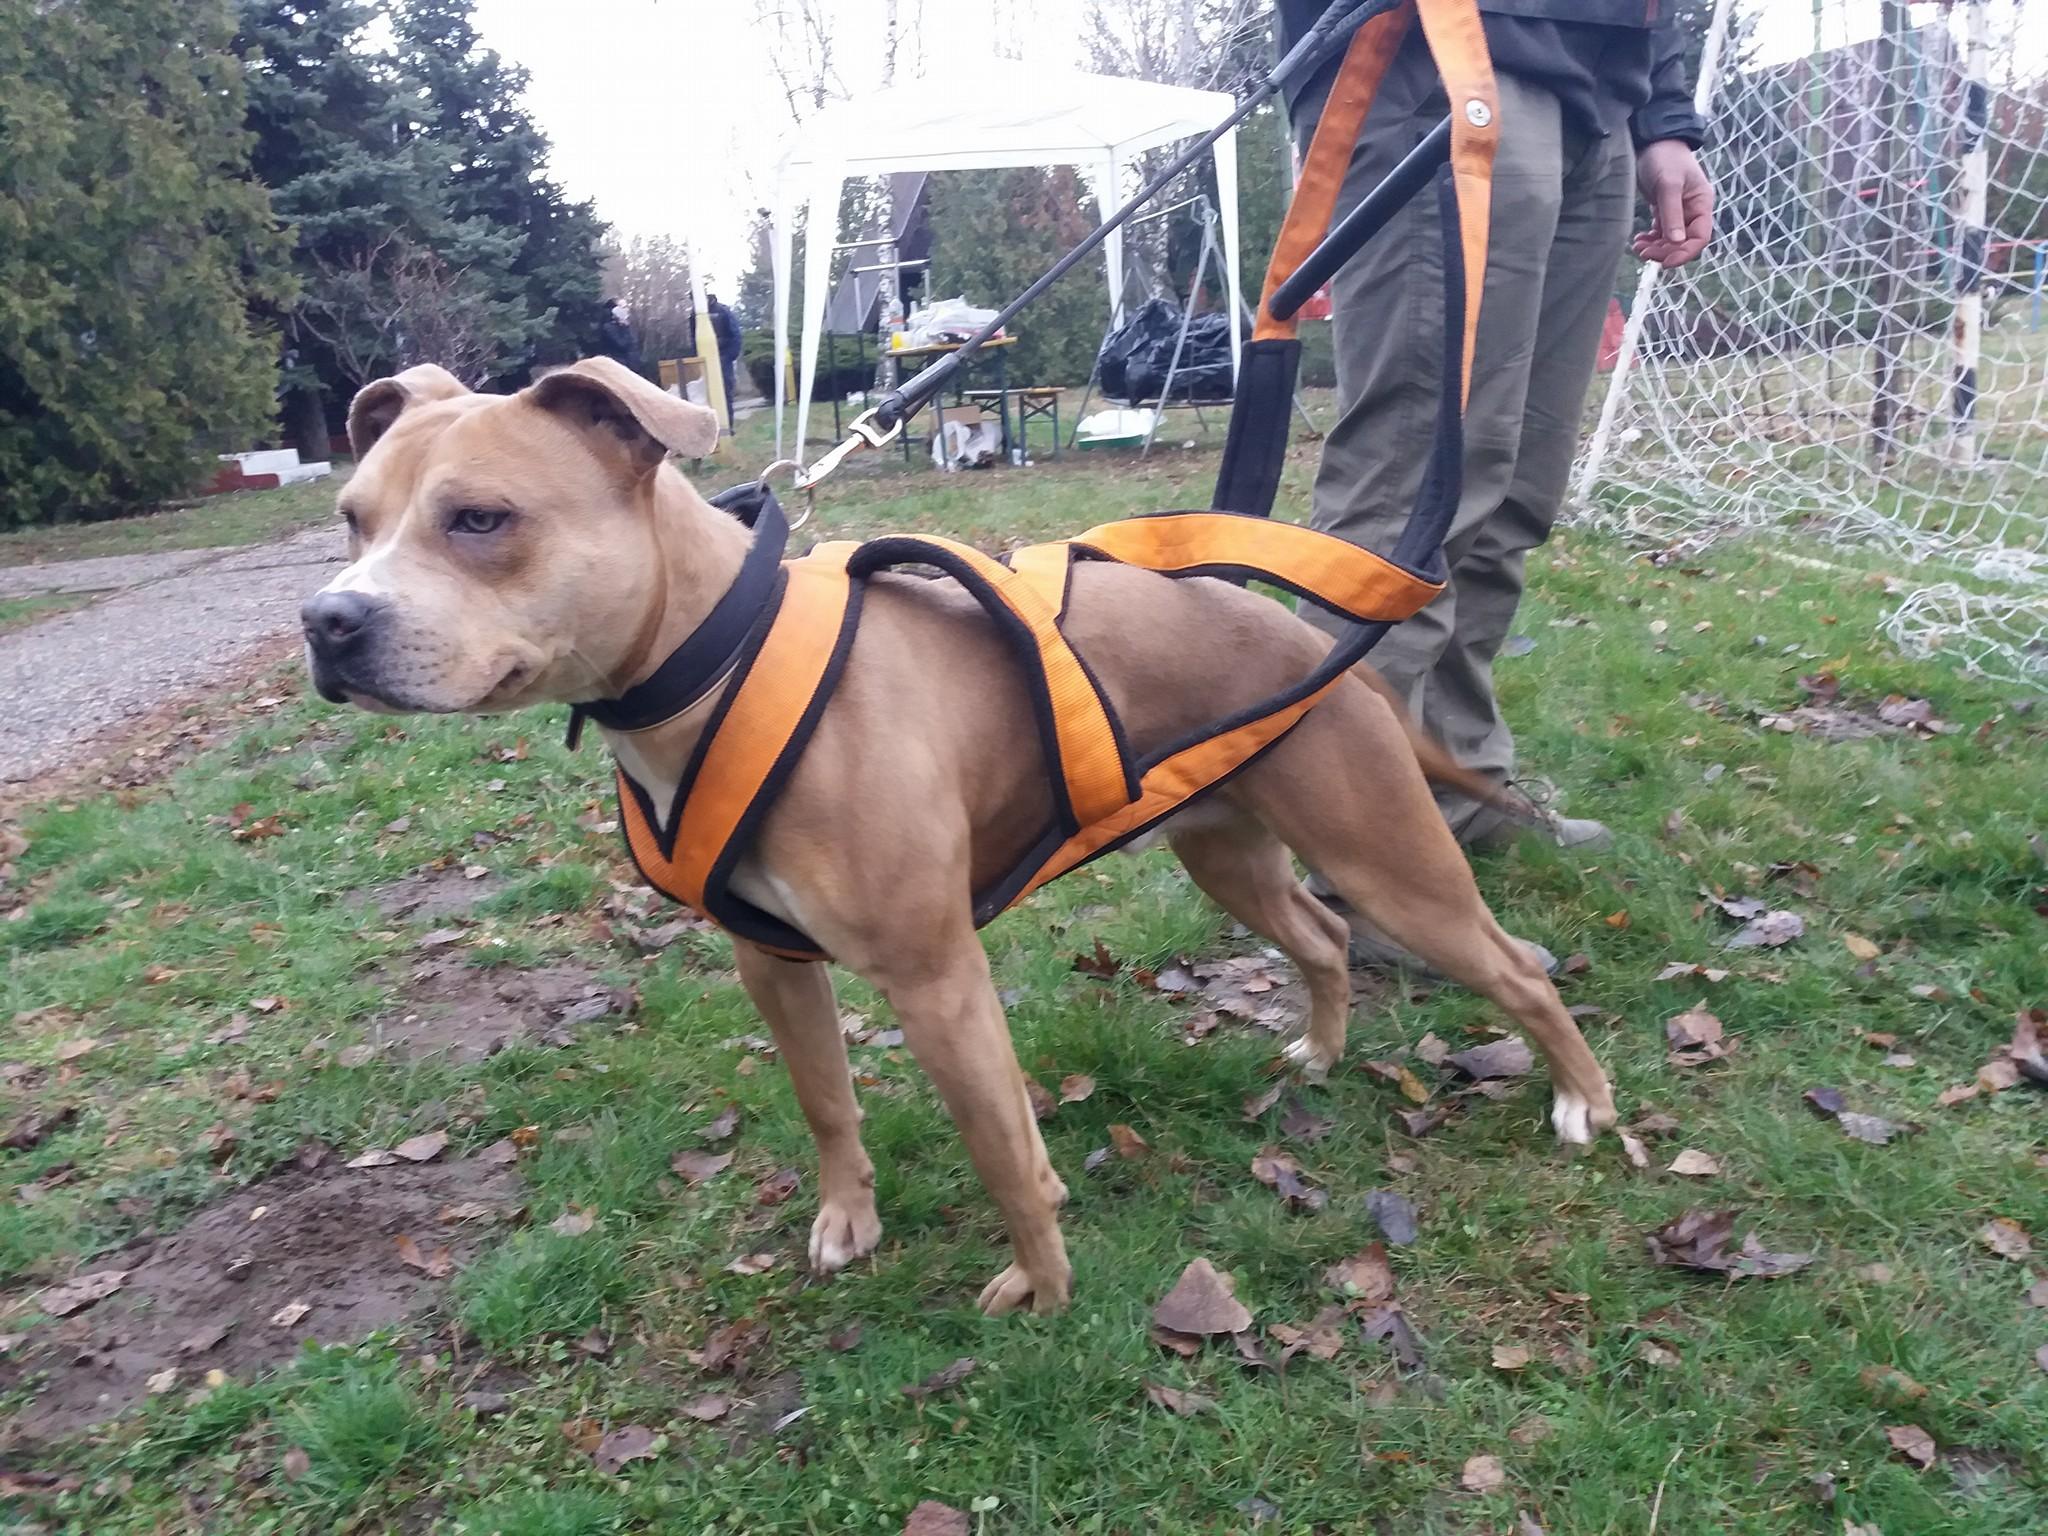 staffordshire-terrier-amstaff-staffie-staff-weight-pull-canine-dog-maddox-sportstaff-sport-working-training.jpg